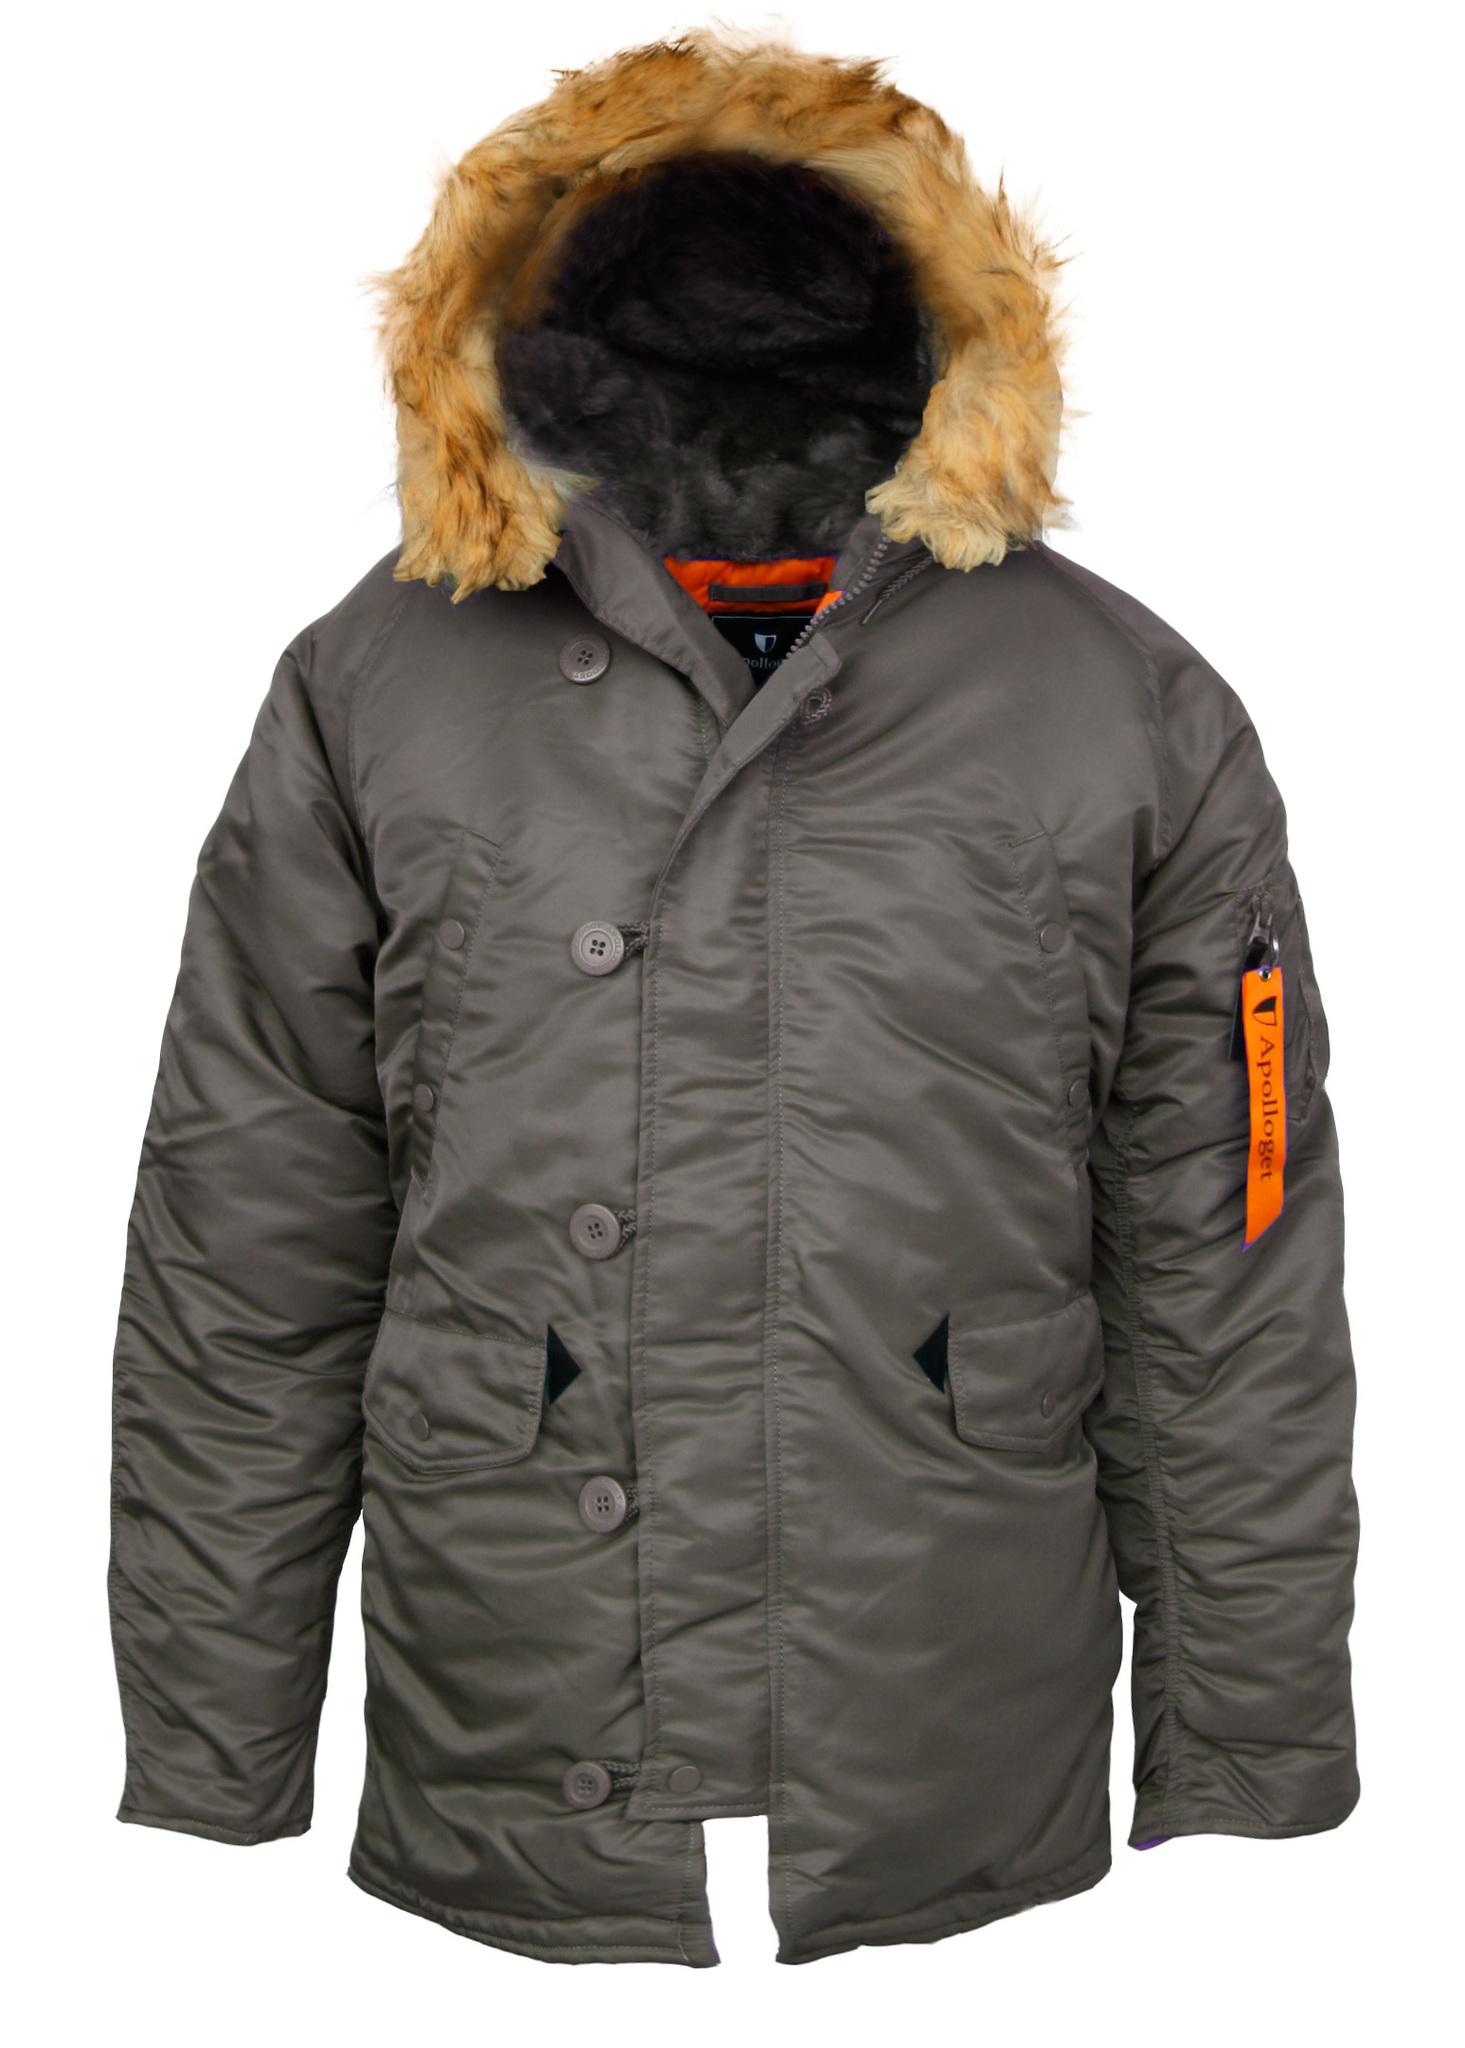 Куртка Аляска  N-3B  Husky Apolloget 2017 (серый - r.grey/orange)